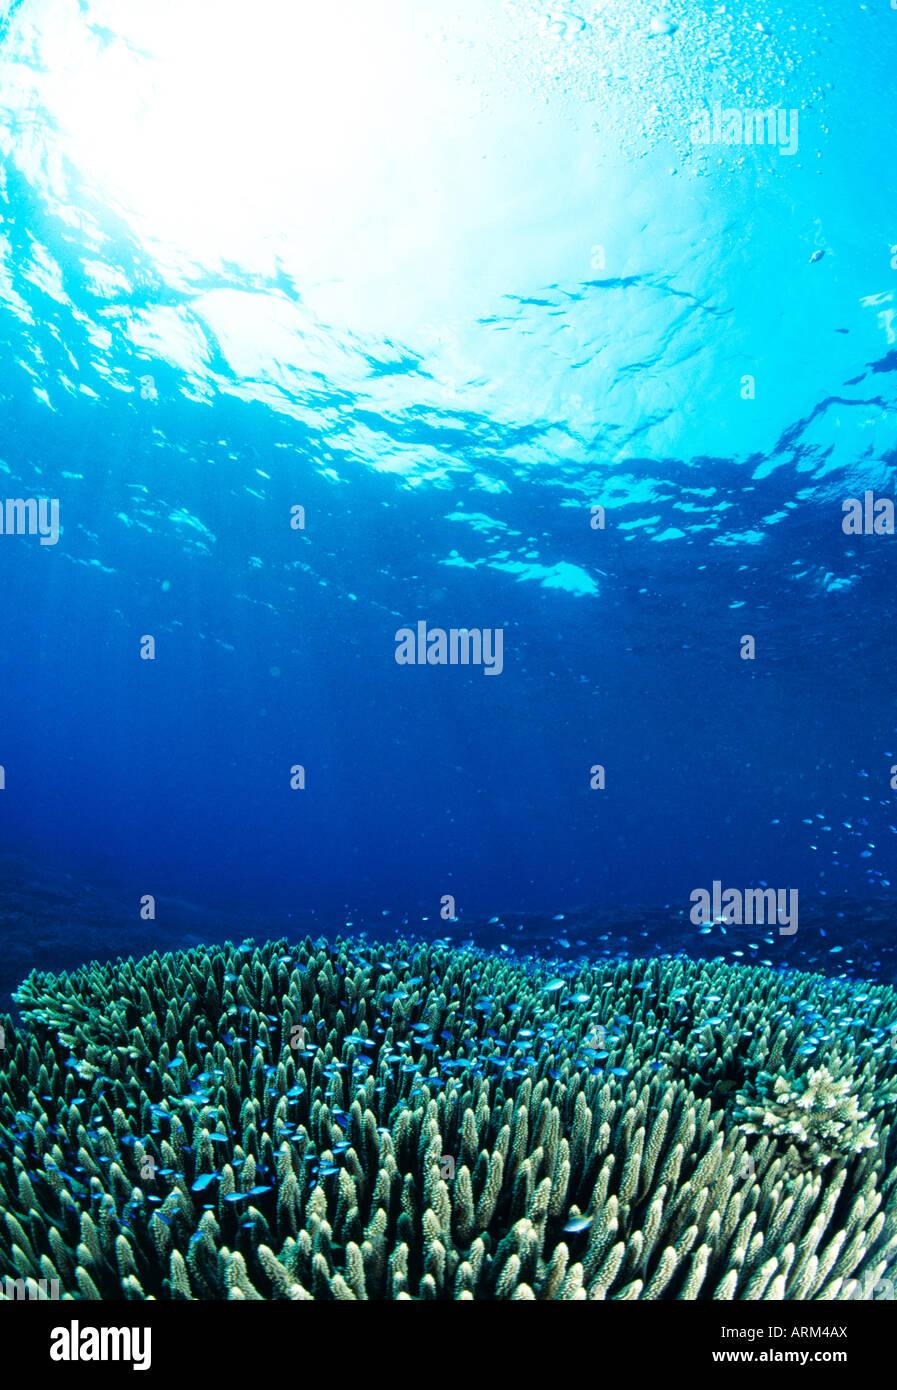 Bluegreen puller (Chromis viridis) and Coral, Okinawa, Japan - Stock Image